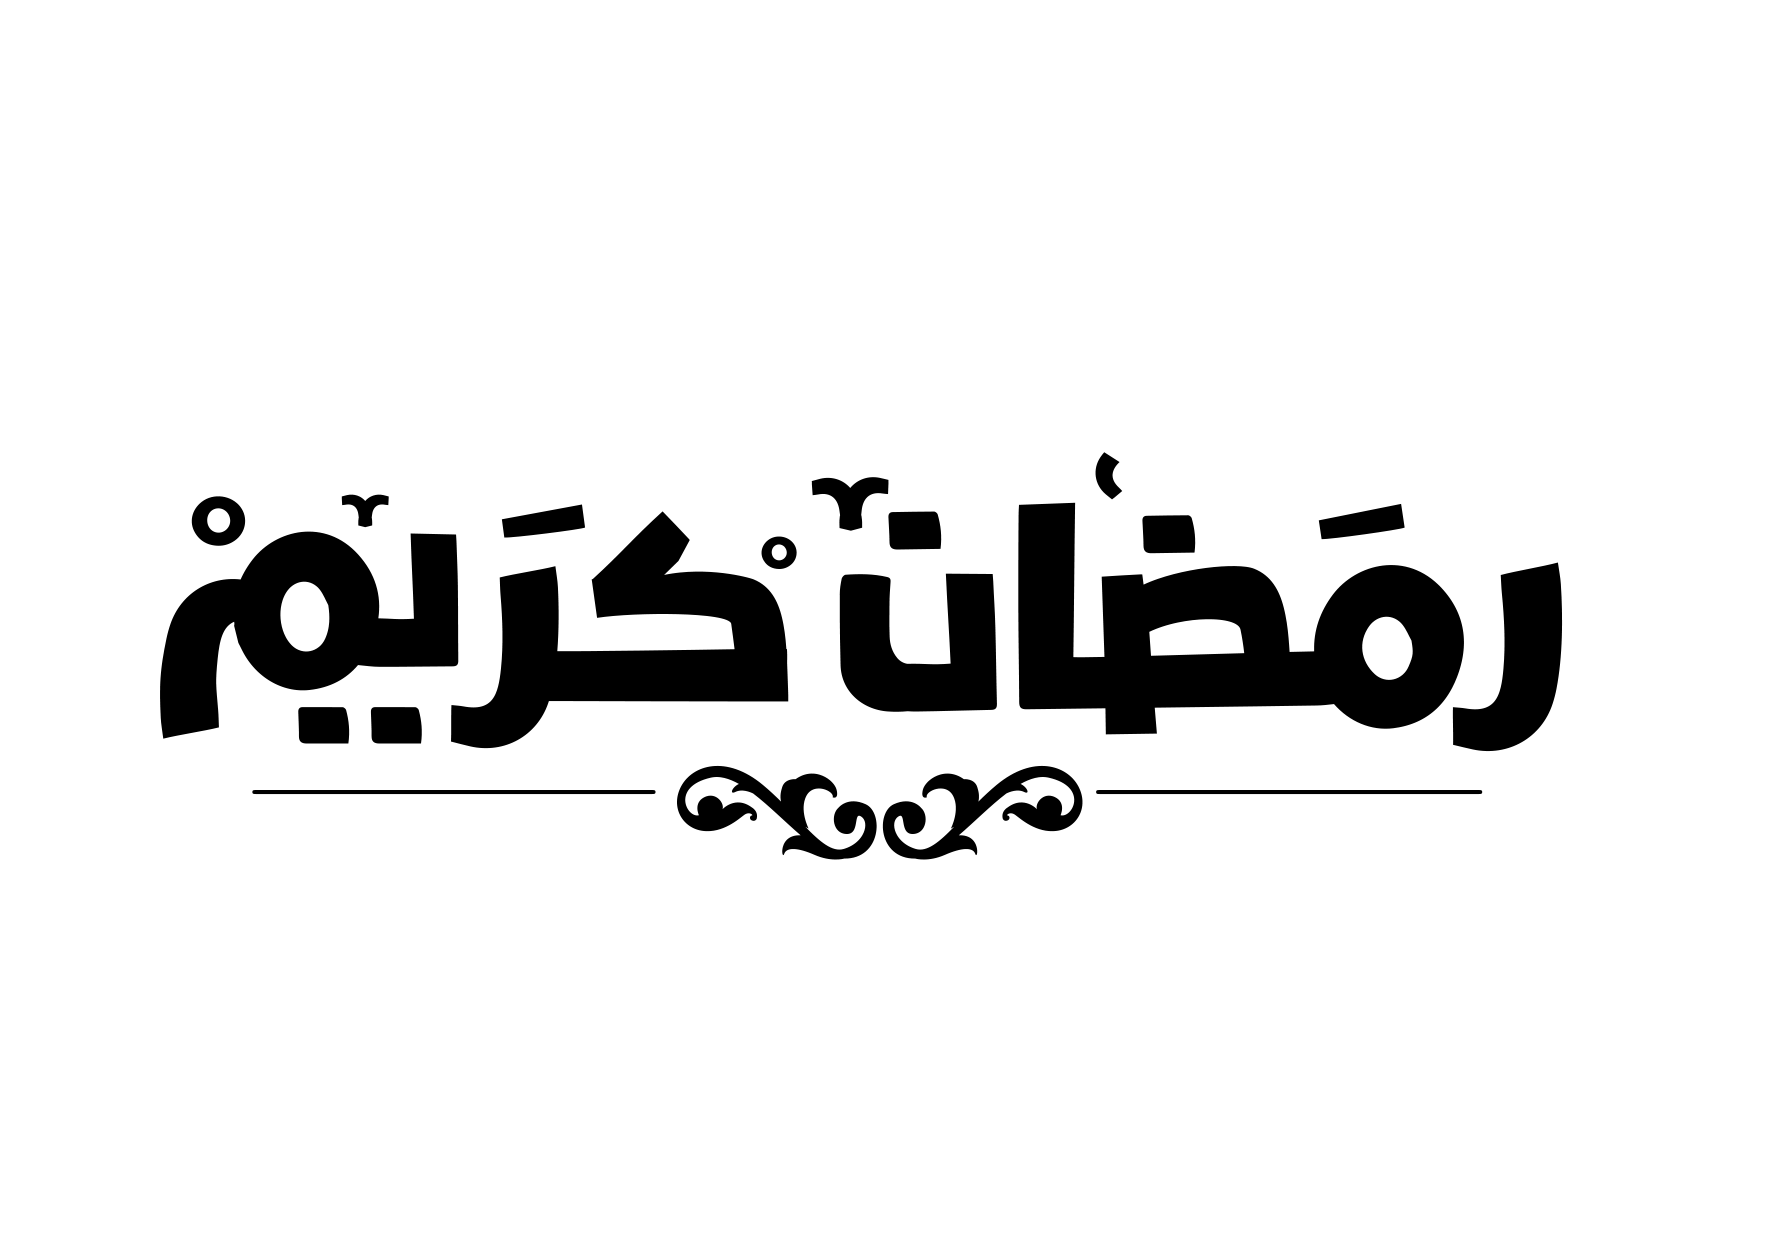 مخطوطه رمضان كريم مفرغه 12 15 مخطوطه لشهر رمضان بالخط الحر png